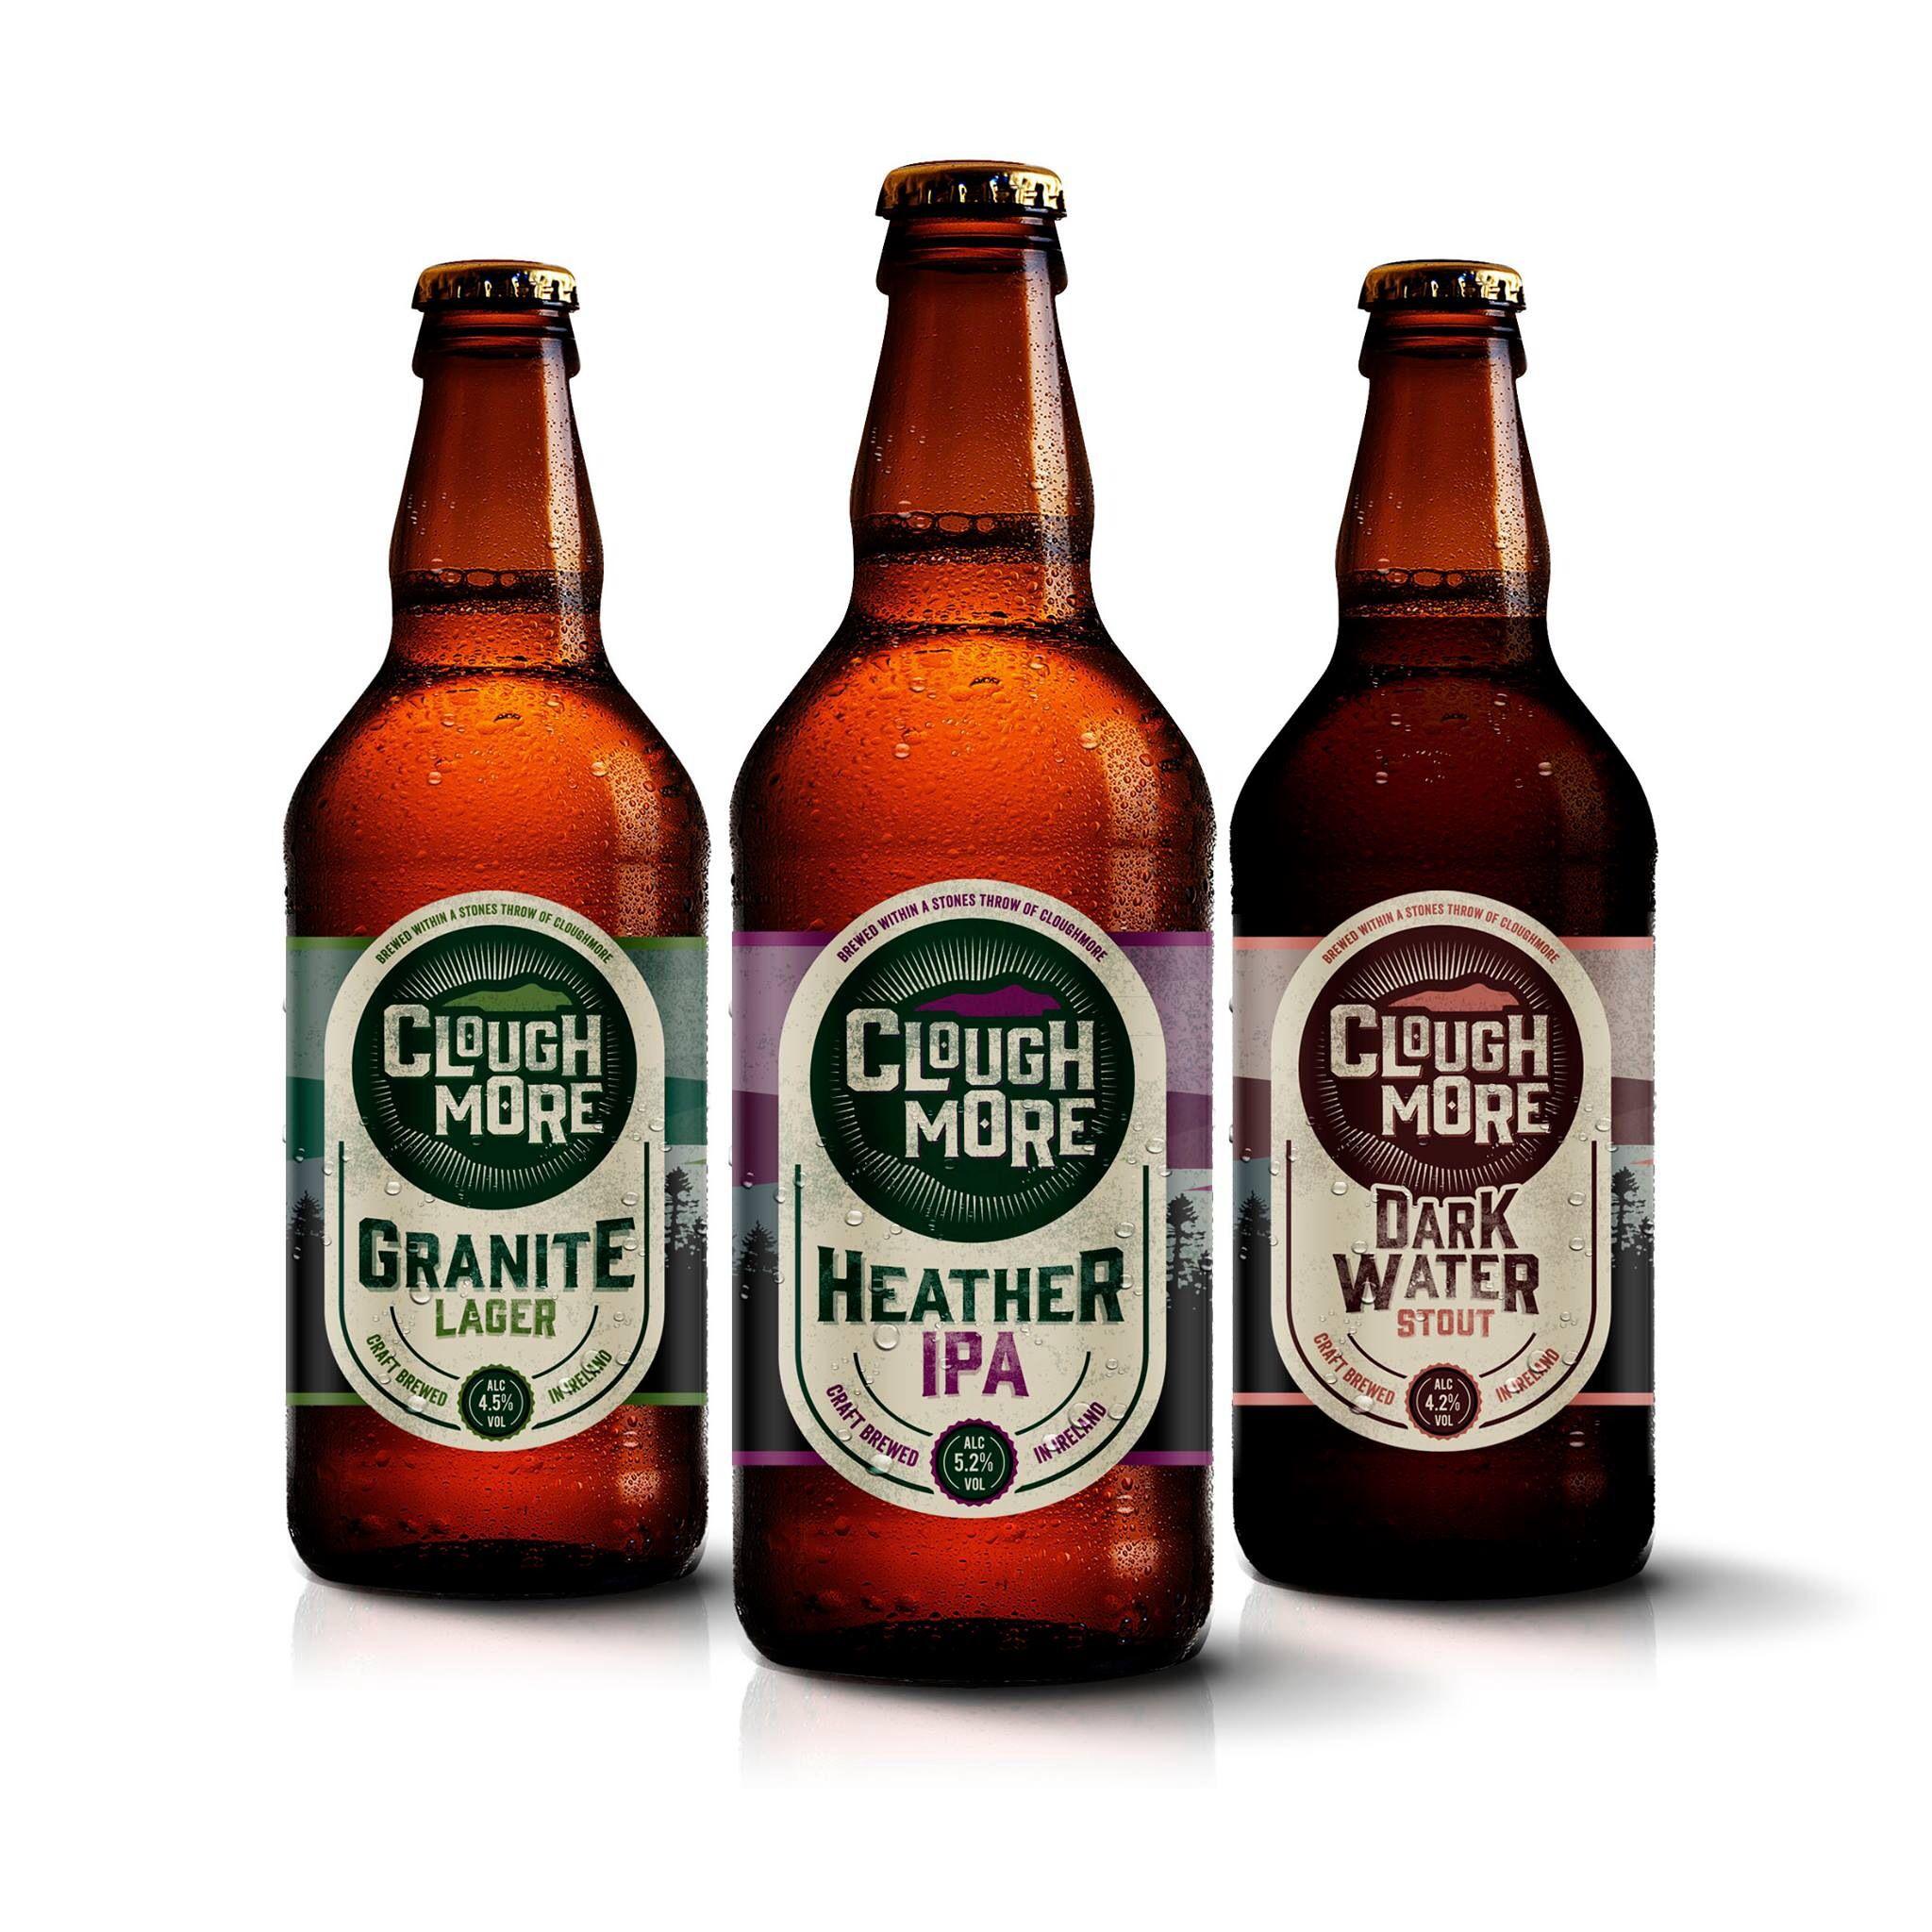 New Irish Craft Beers Designed By Www Be Studios Co Uk Dark Lager Craft Beer Ideas Craft Beer